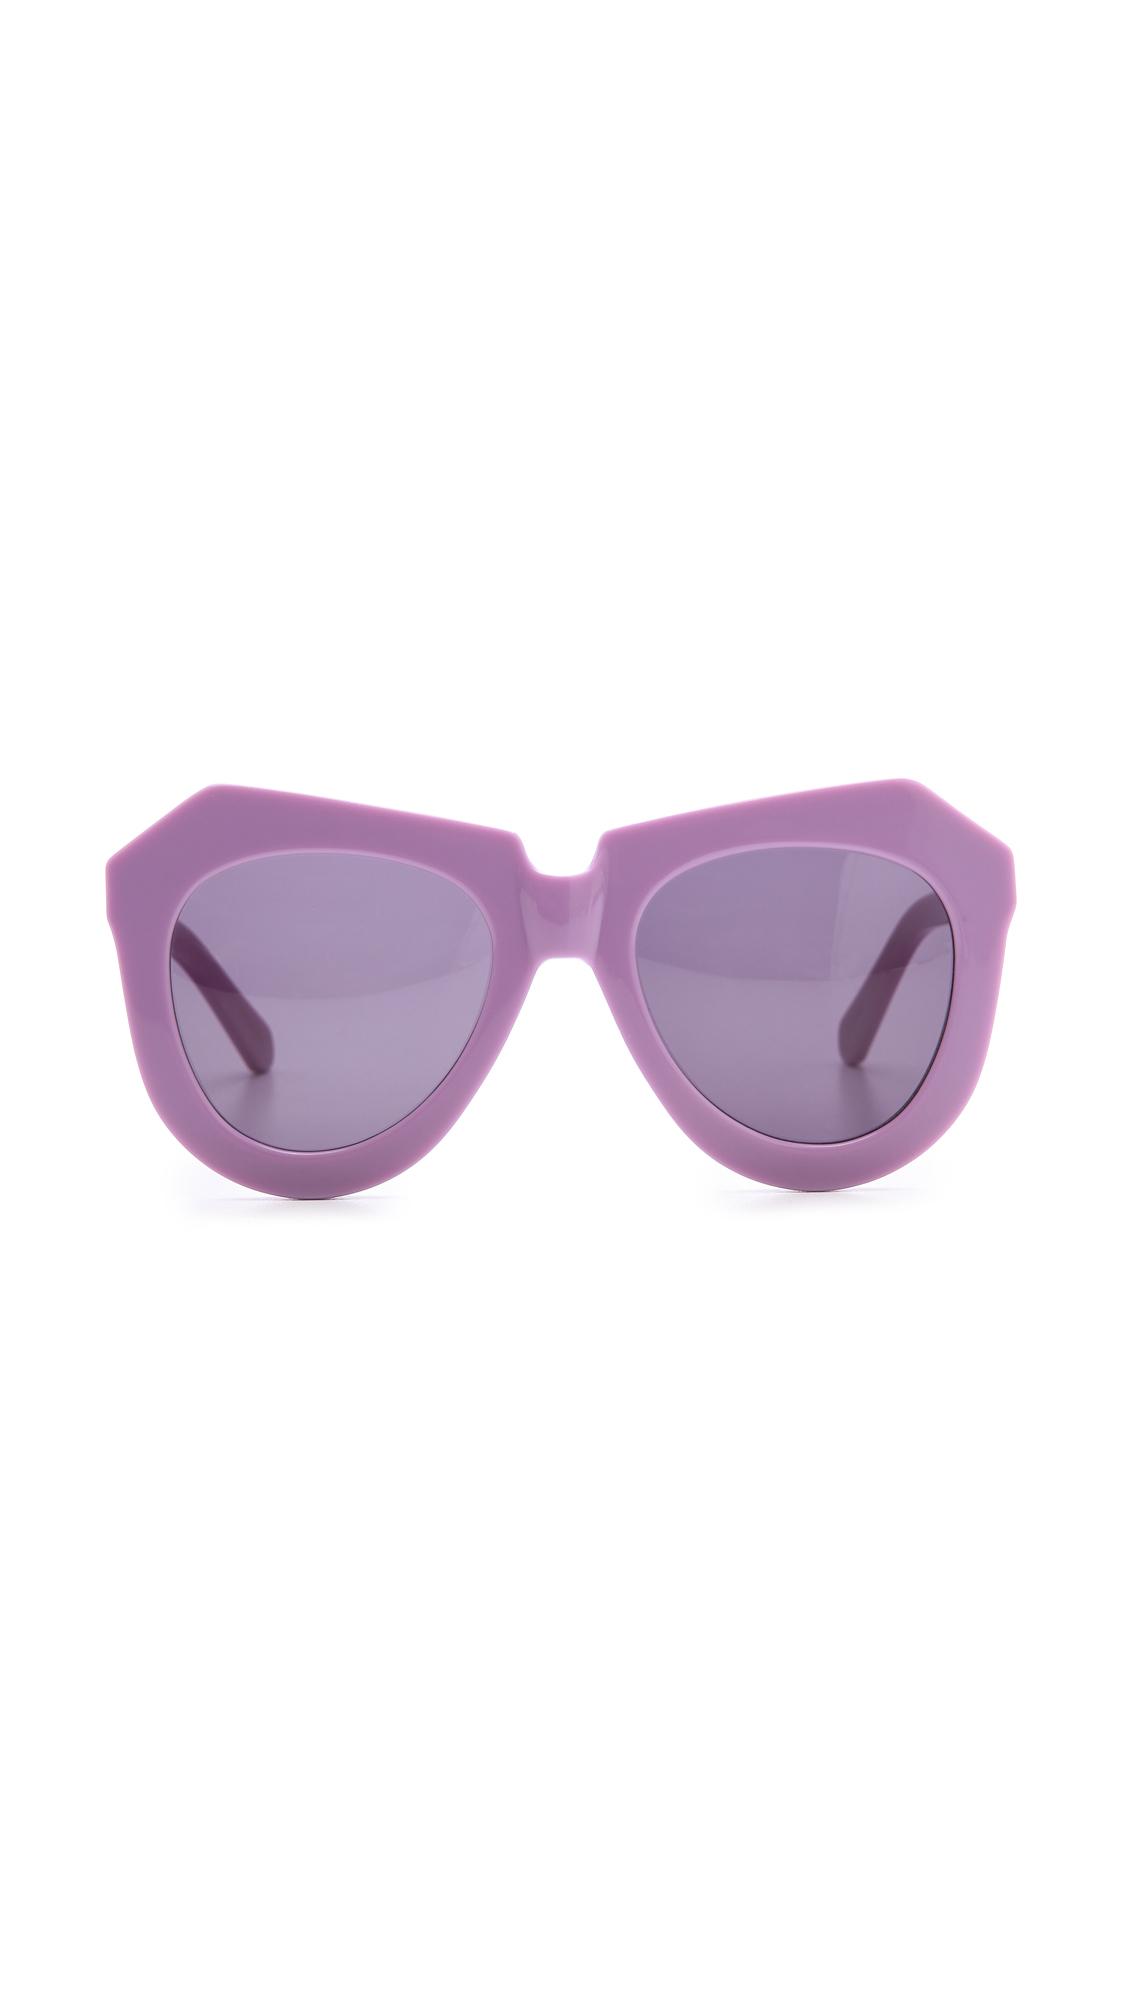 8ae7872df77 Karen Walker One Worship Sunglasses